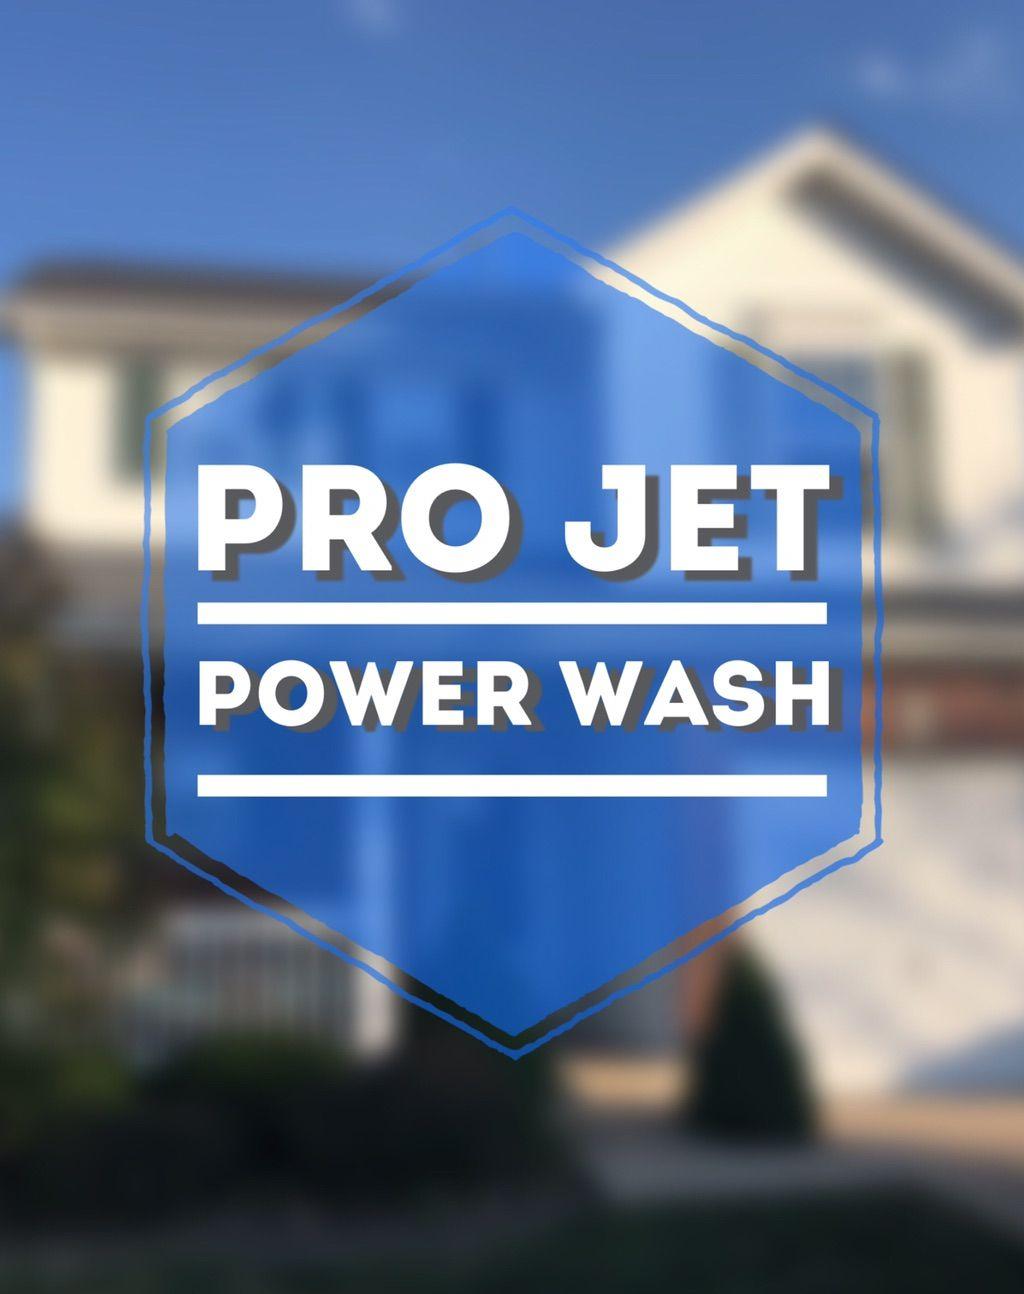 Pro Jet Power Wash